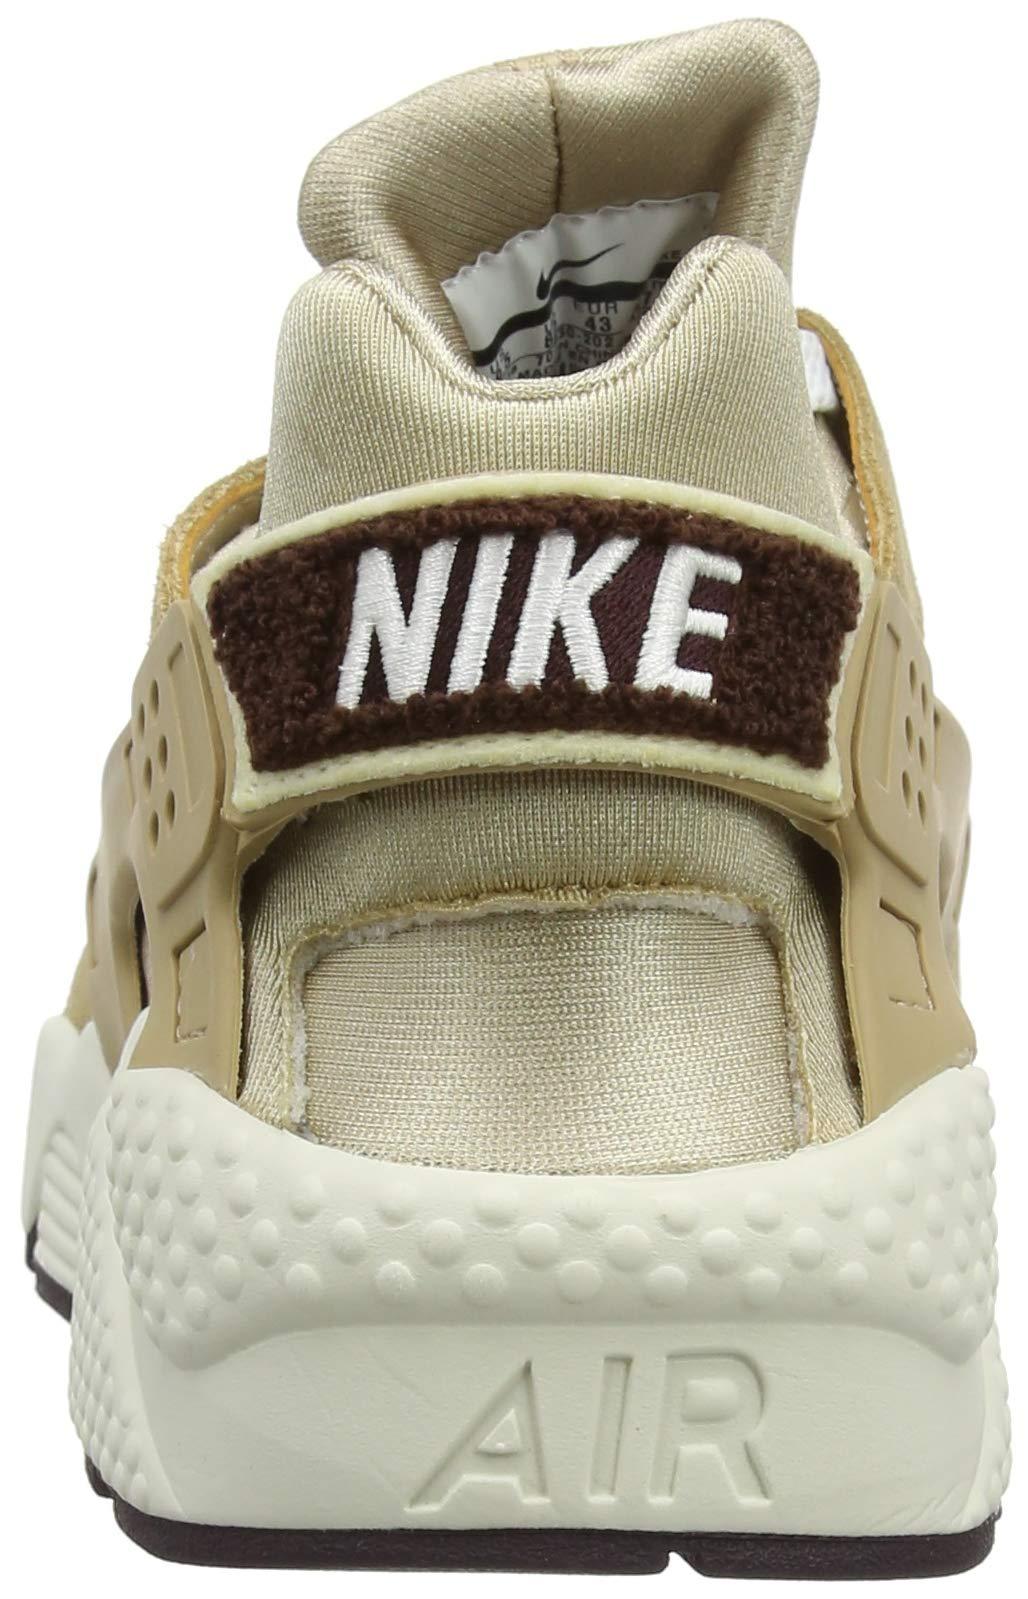 71n9G5GTcrL - Nike Men's Air Huarache Run PRM Fitness Shoes